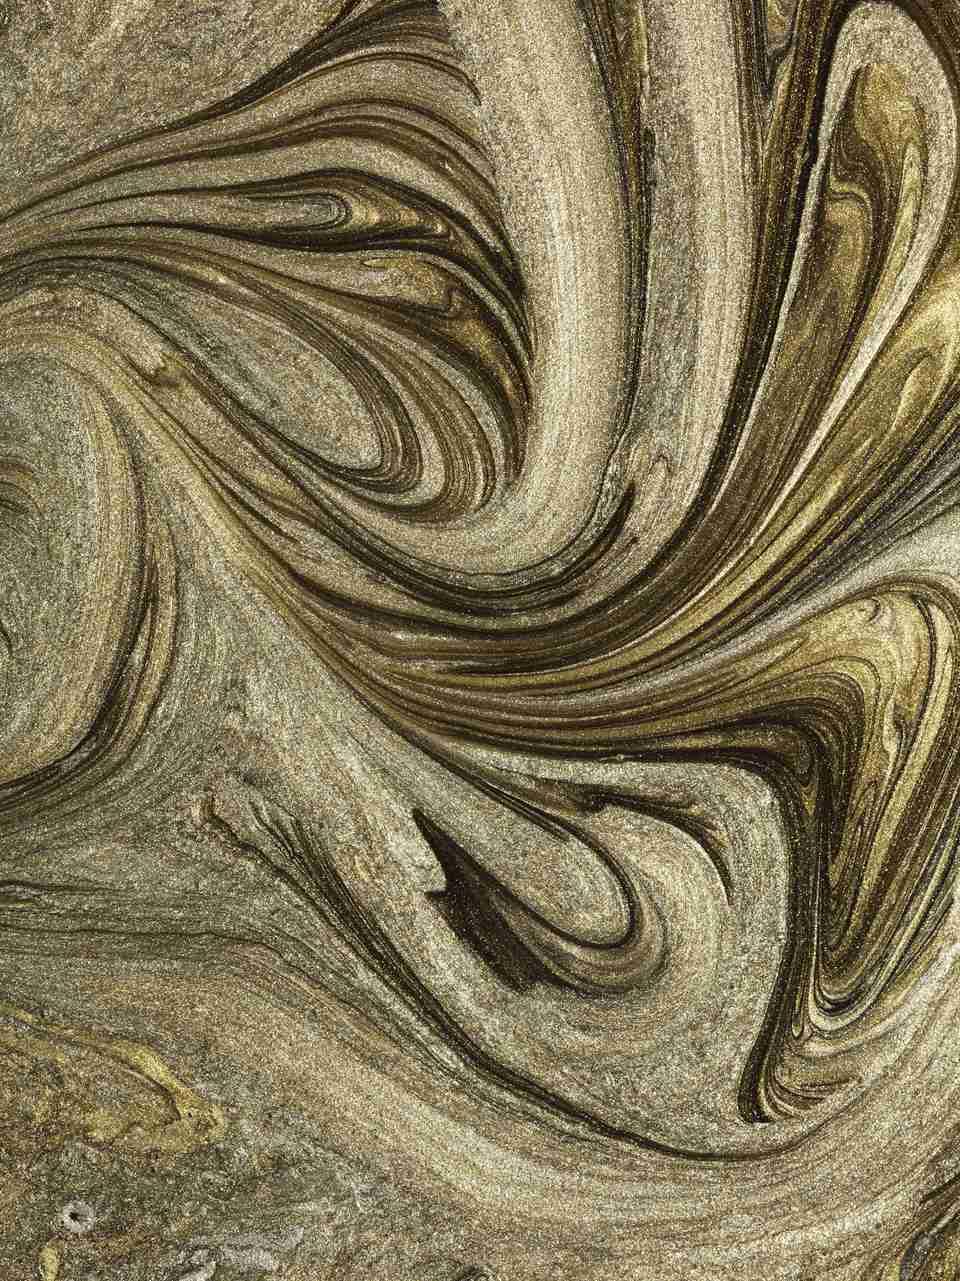 Glitter gold marbled paint swirl patterns